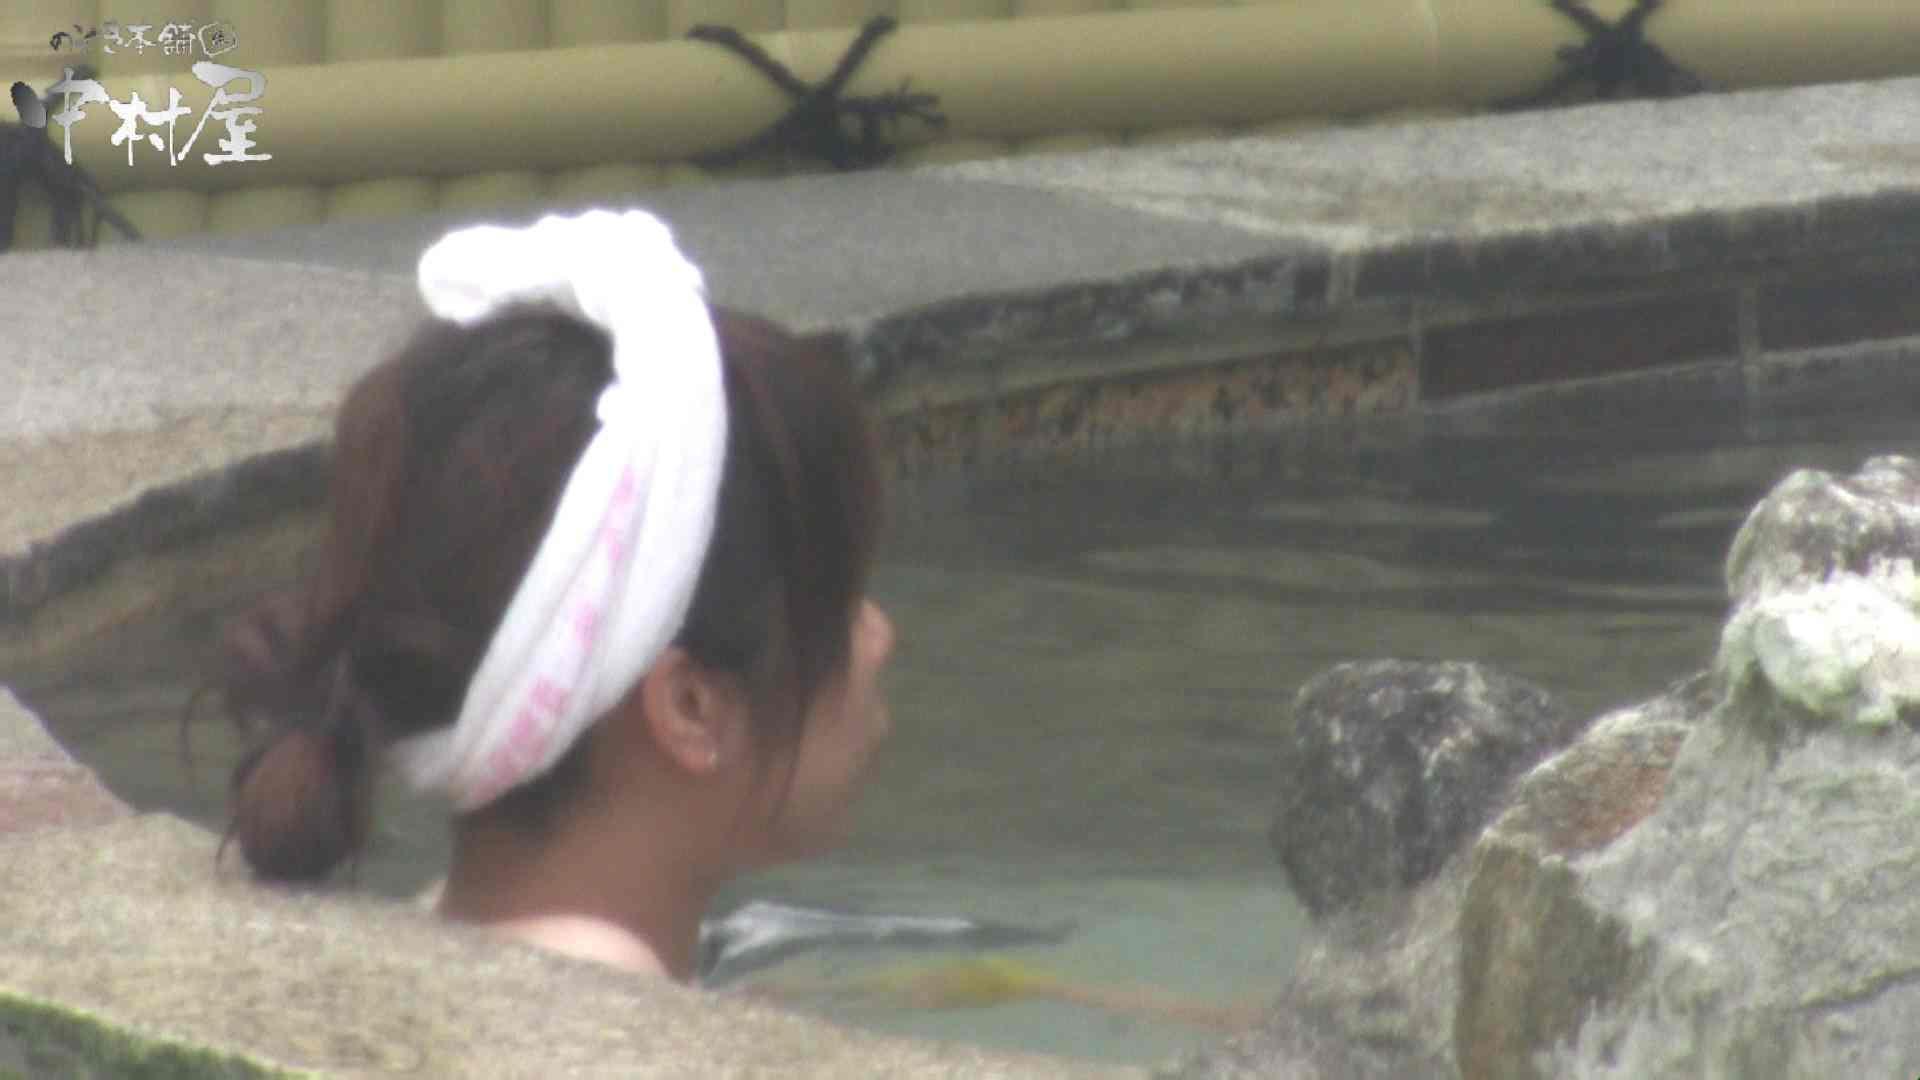 Aquaな露天風呂Vol.926 露天  33連発 12